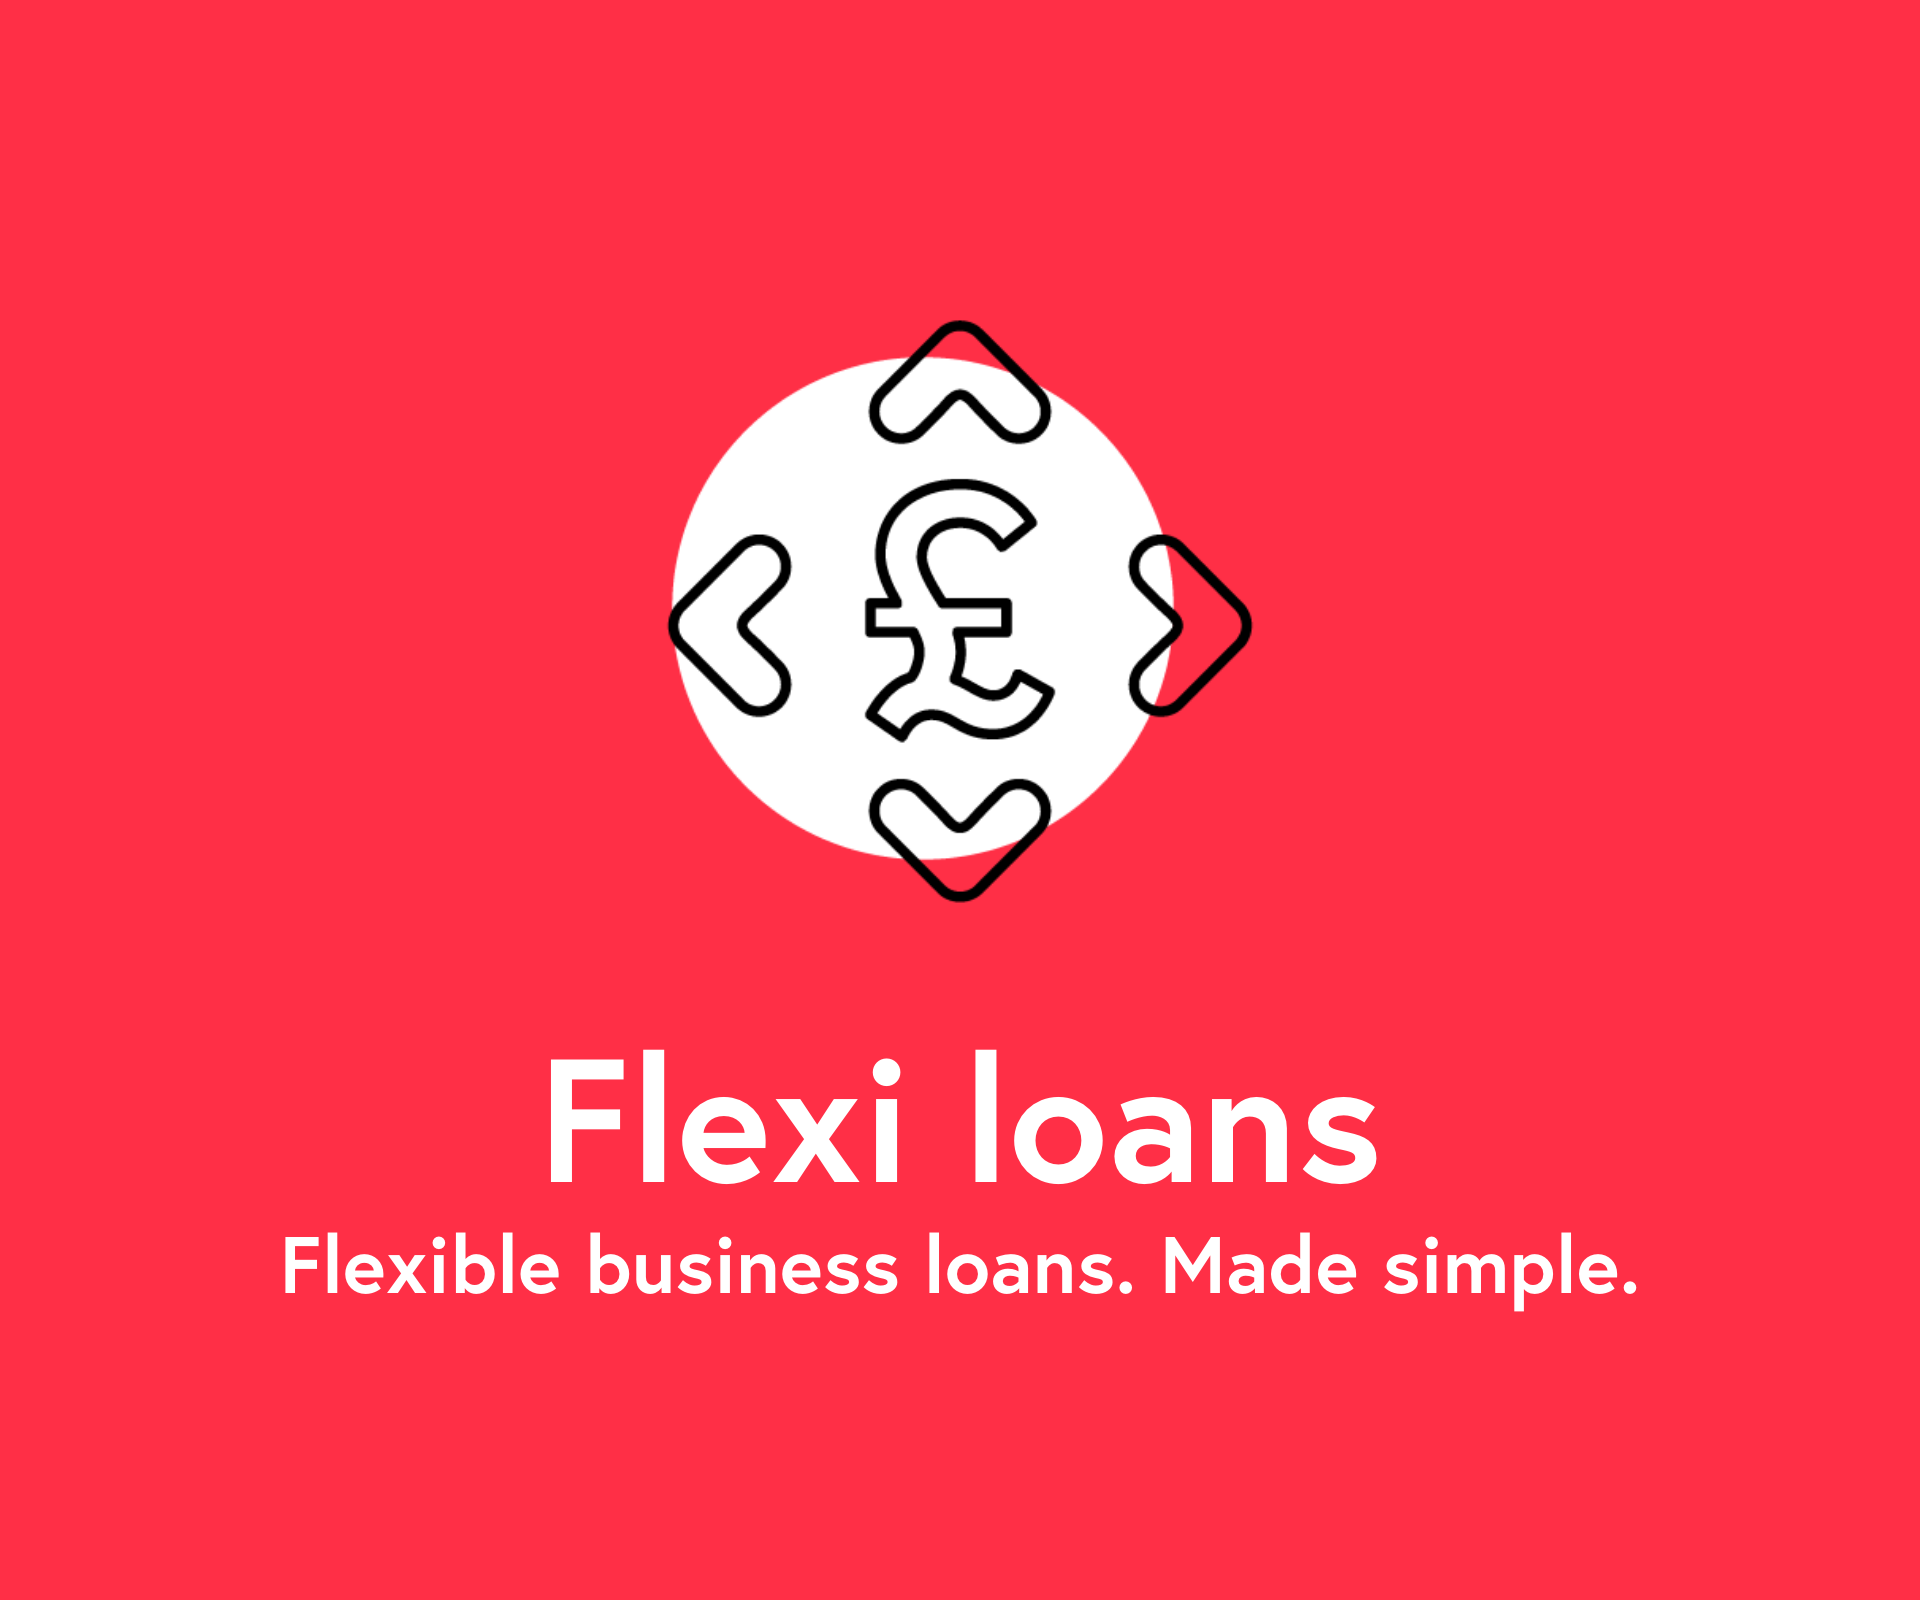 Flexi loans - Johnson Reed